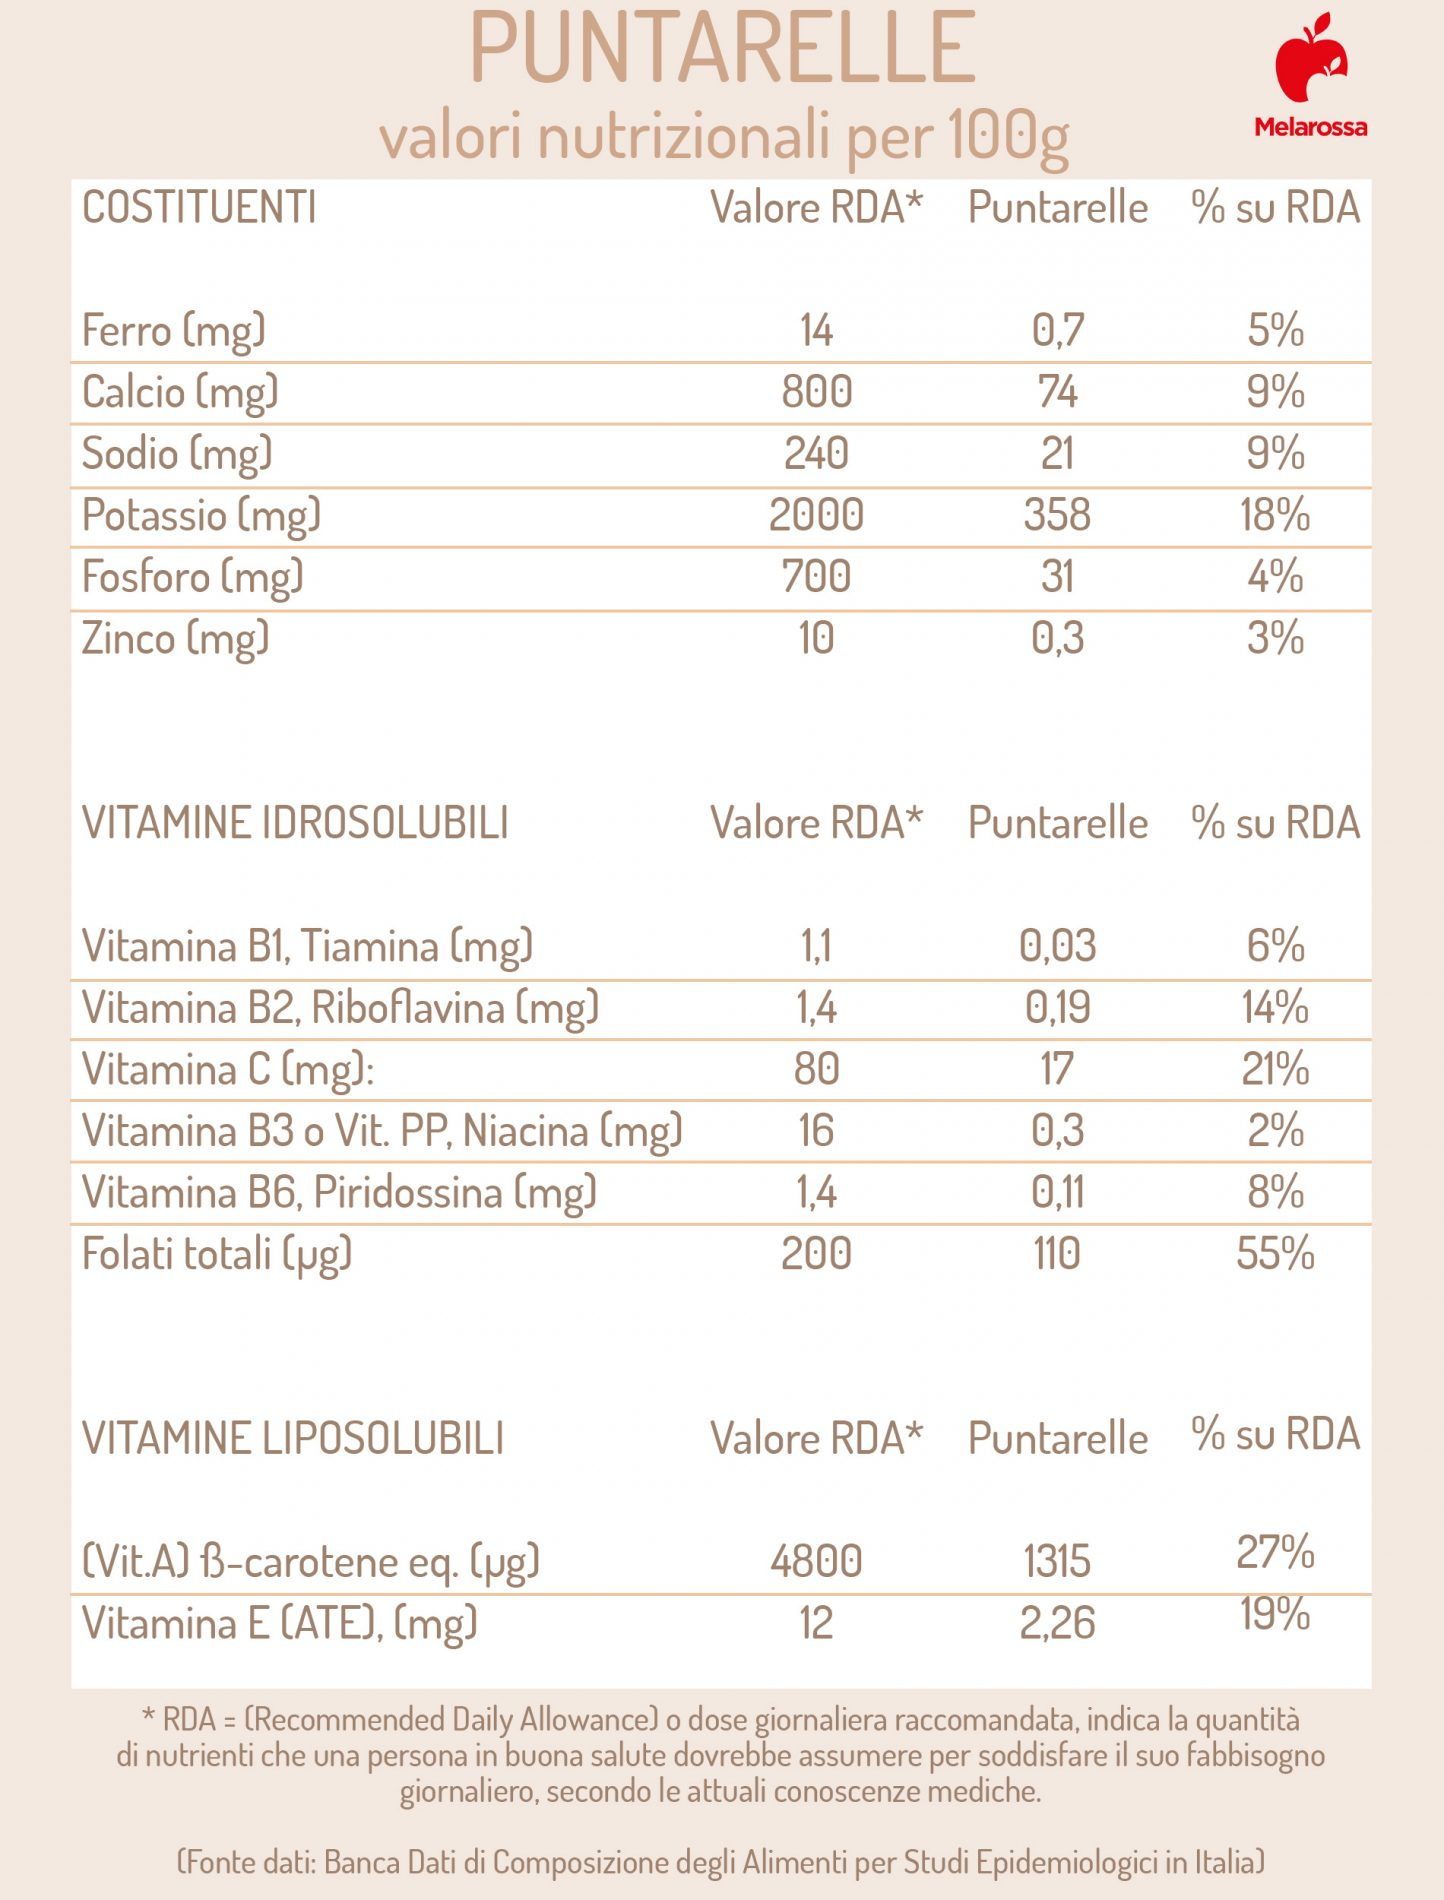 puntarelle: valori nutrizionali